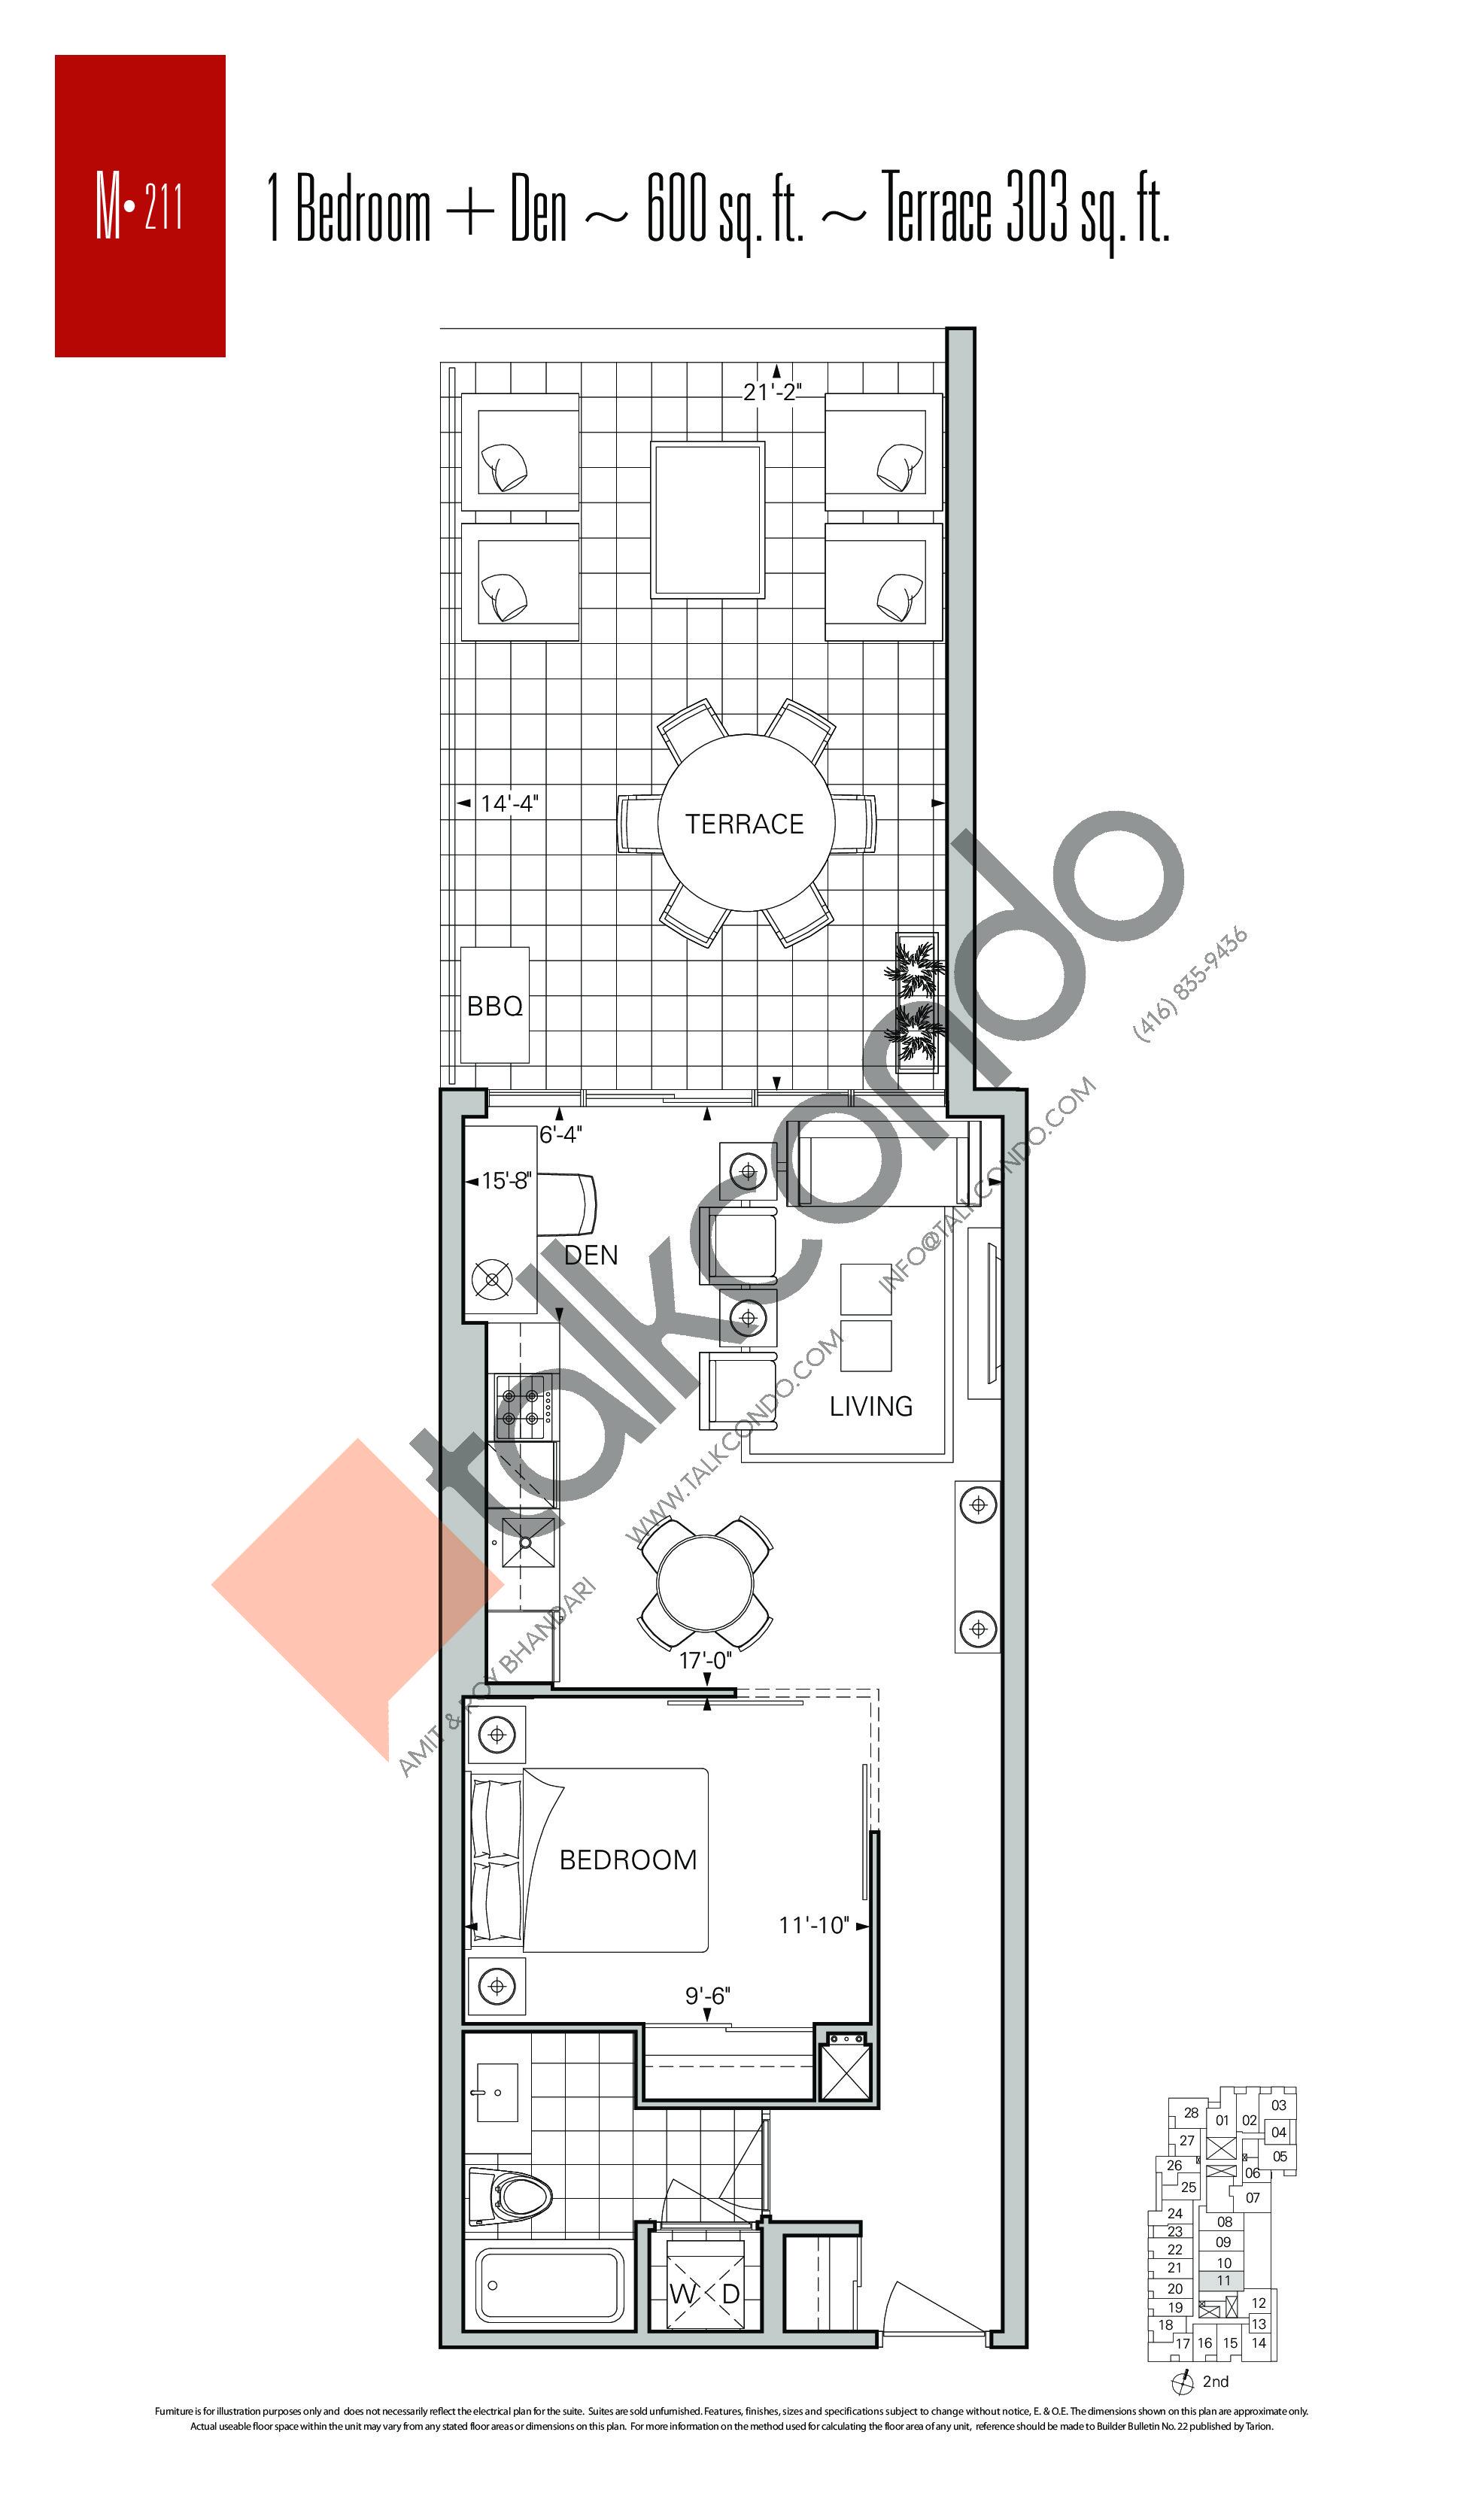 M-211 Floor Plan at Rise Condos - 600 sq.ft